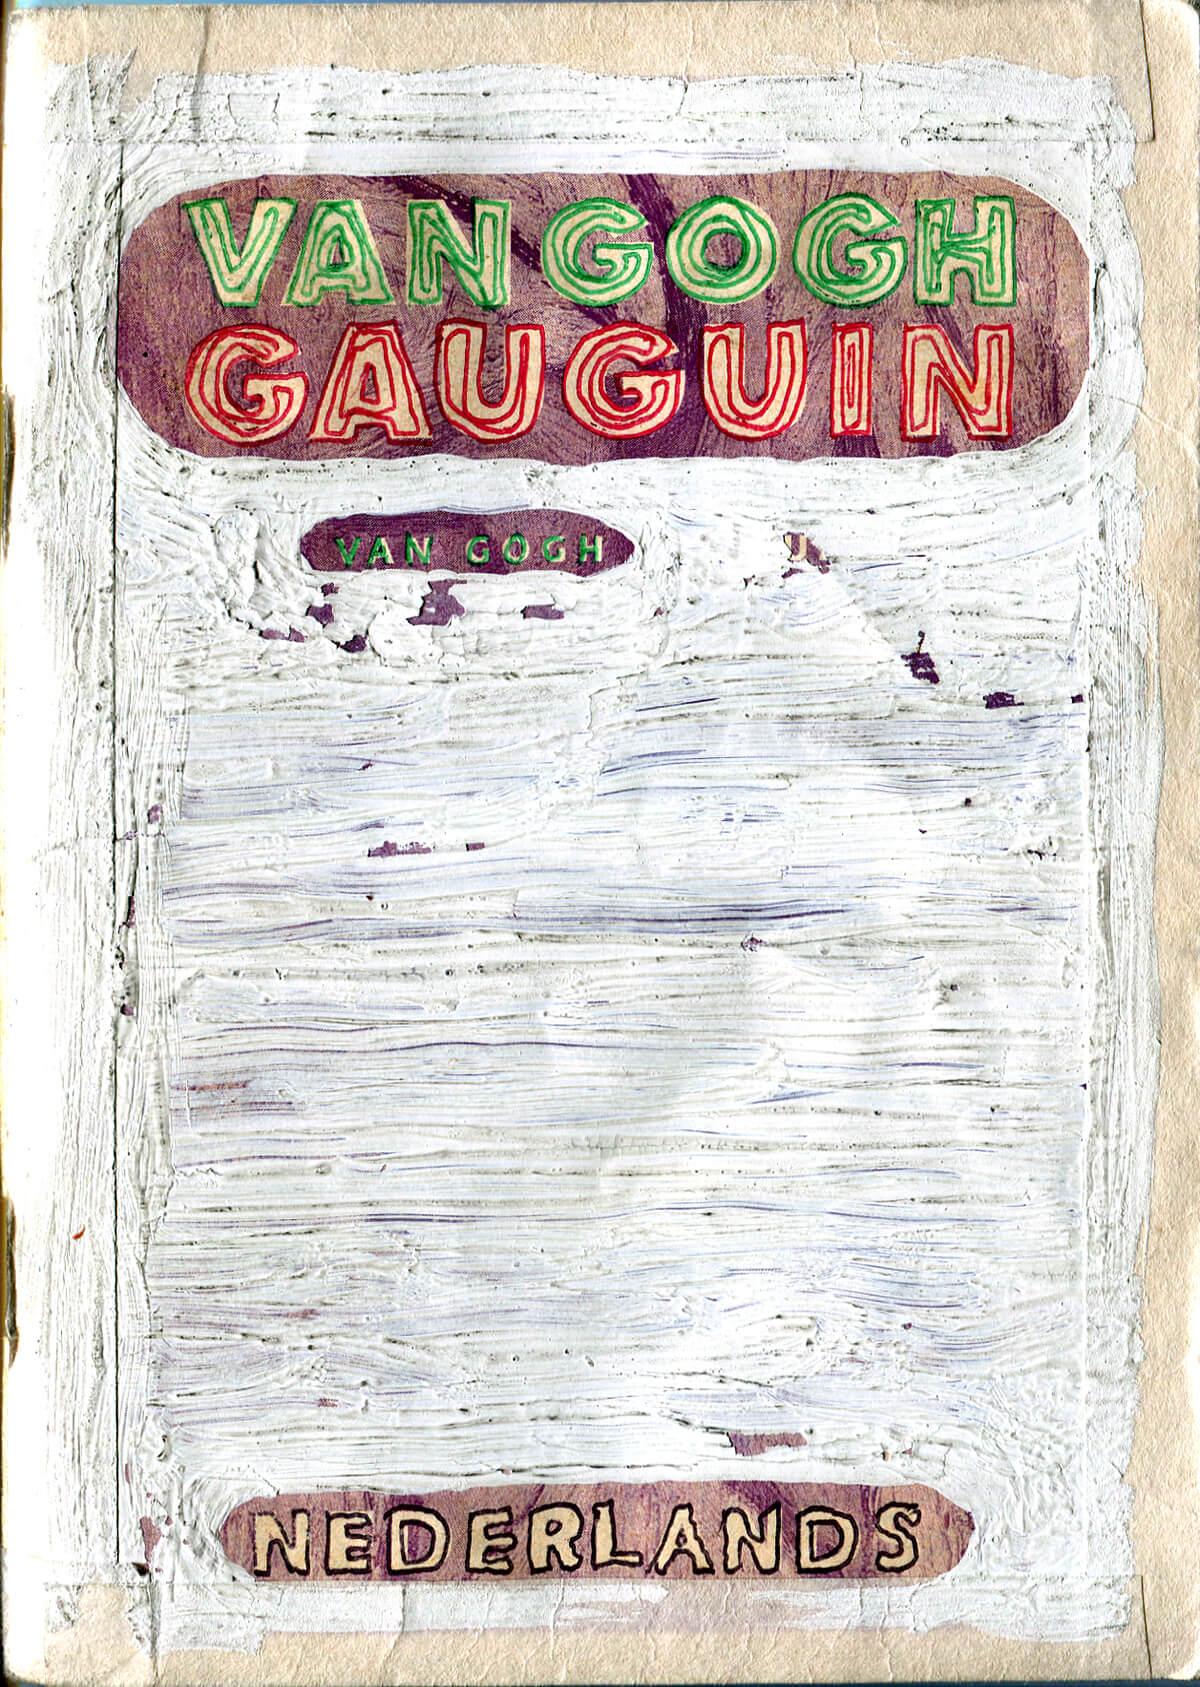 Van Gogh&Gauguin: Encircle, Dutch version, cover, 15 x 10.4 cm, 2002